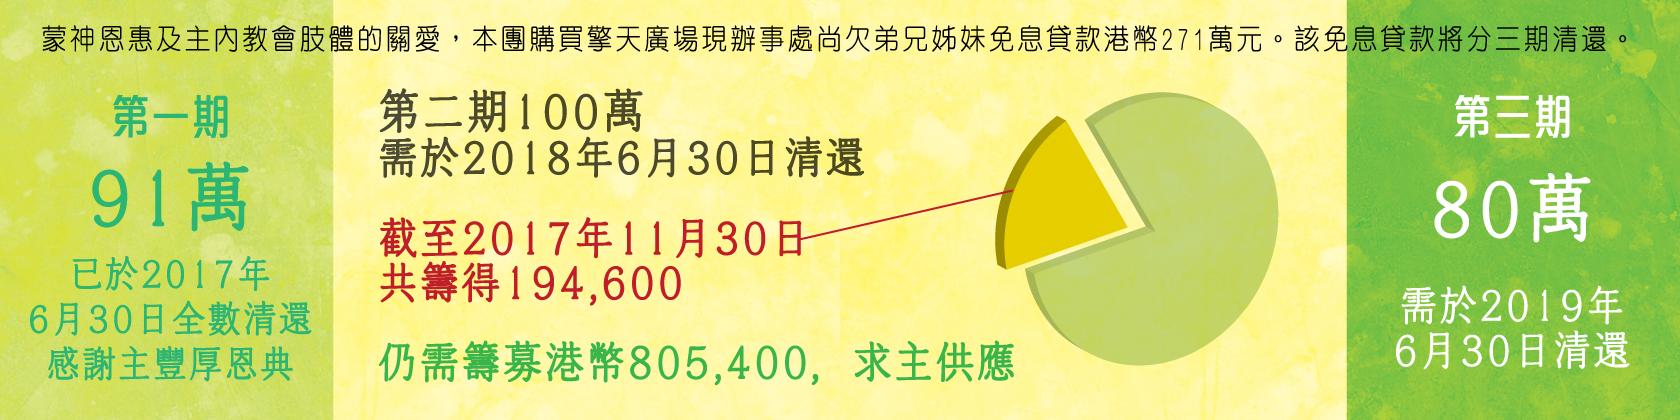 CB-02-web-banner-1680-x-420-055